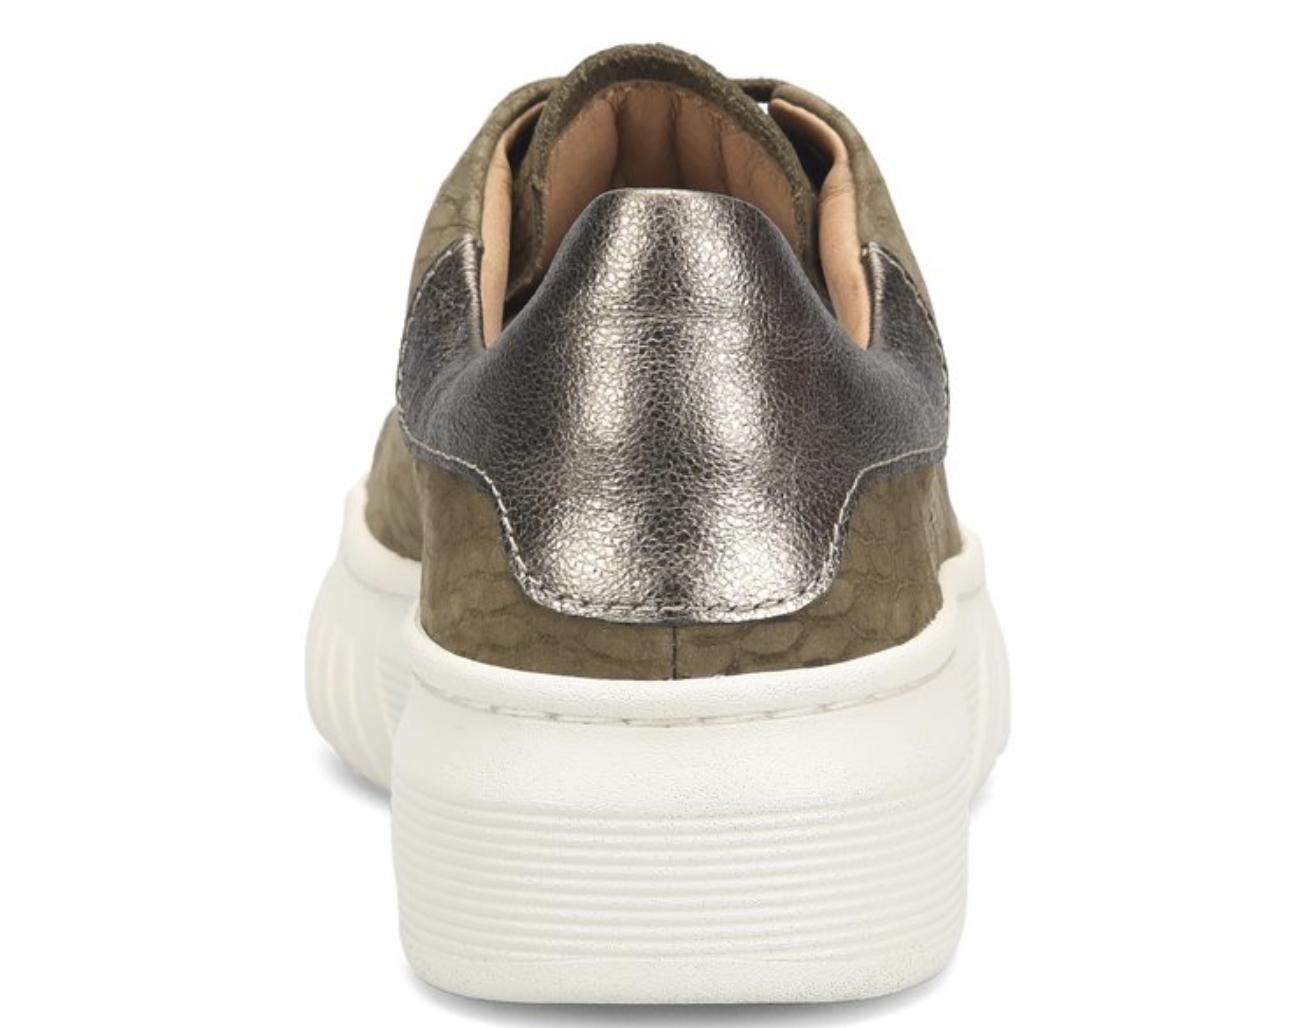 Sofft Shoe Company Parkyn-Olive